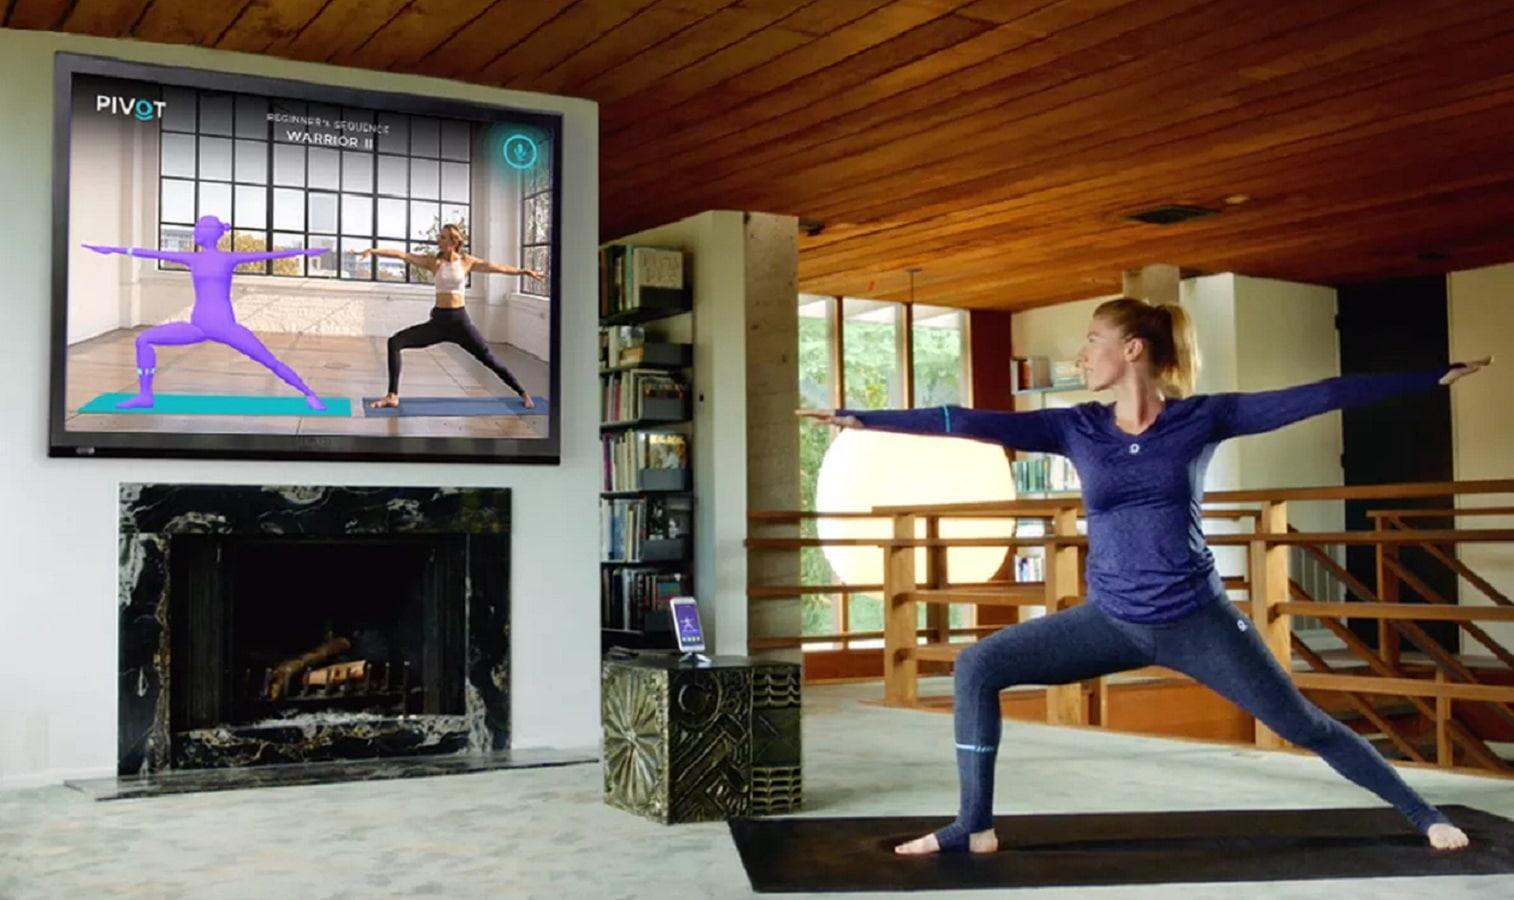 pivot smart yoga clothes